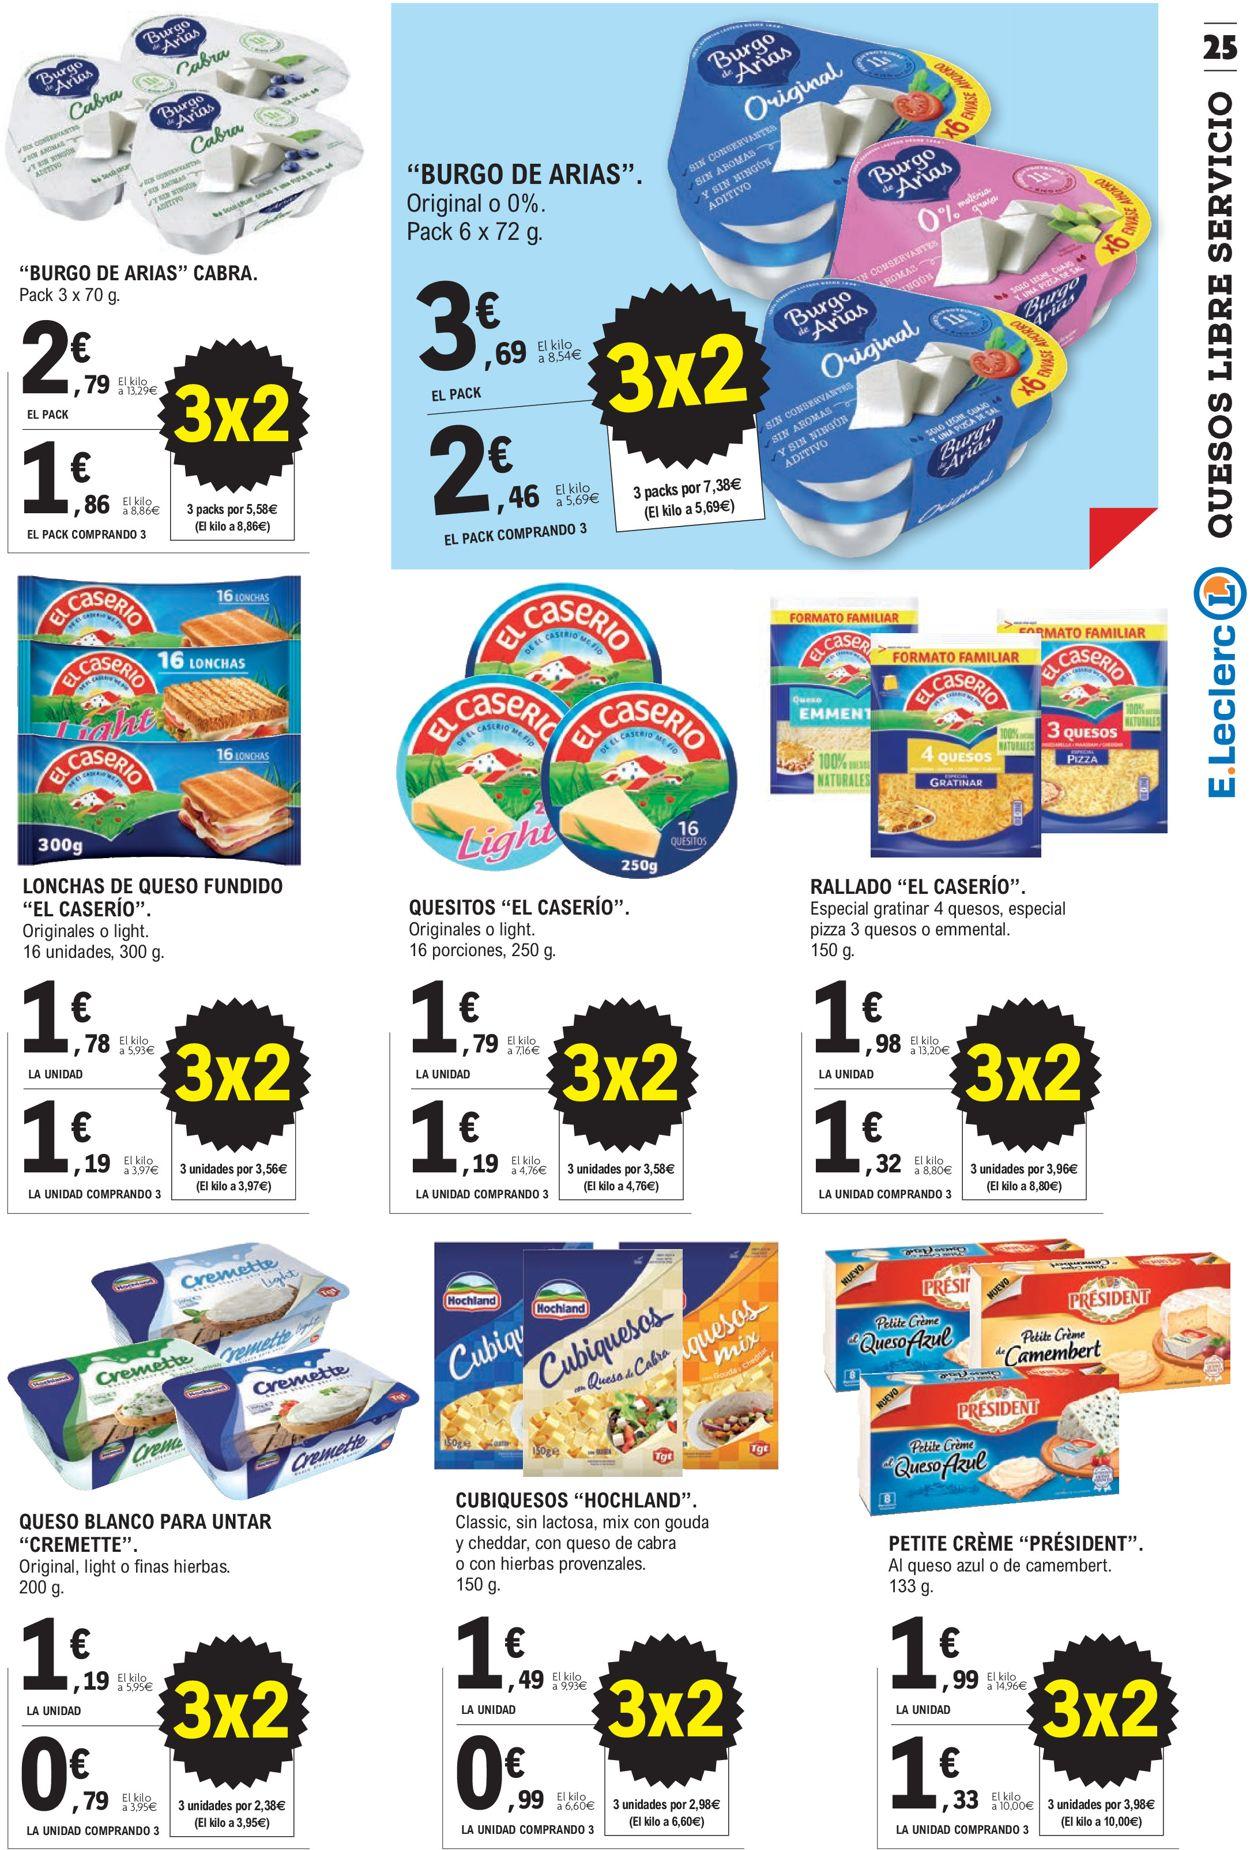 E.leclerc Folleto - 28.10-08.11.2020 (Página 25)